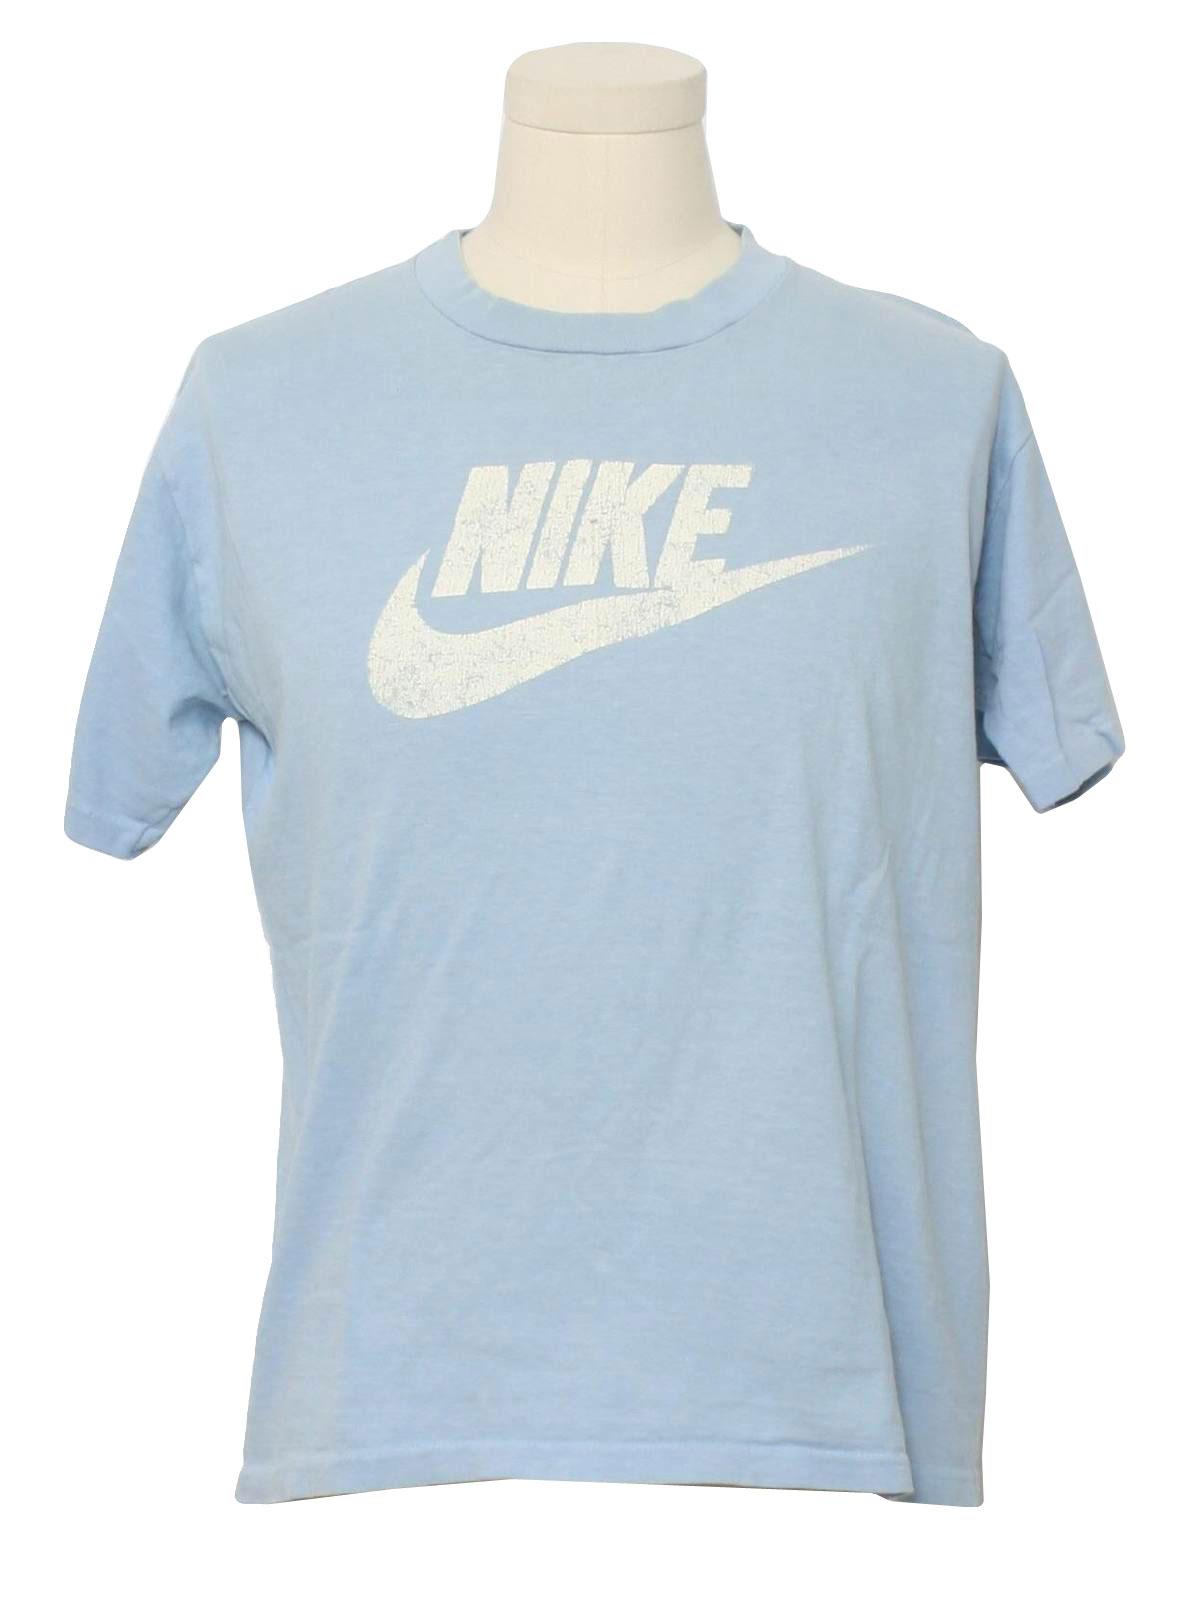 nike 70s shirt